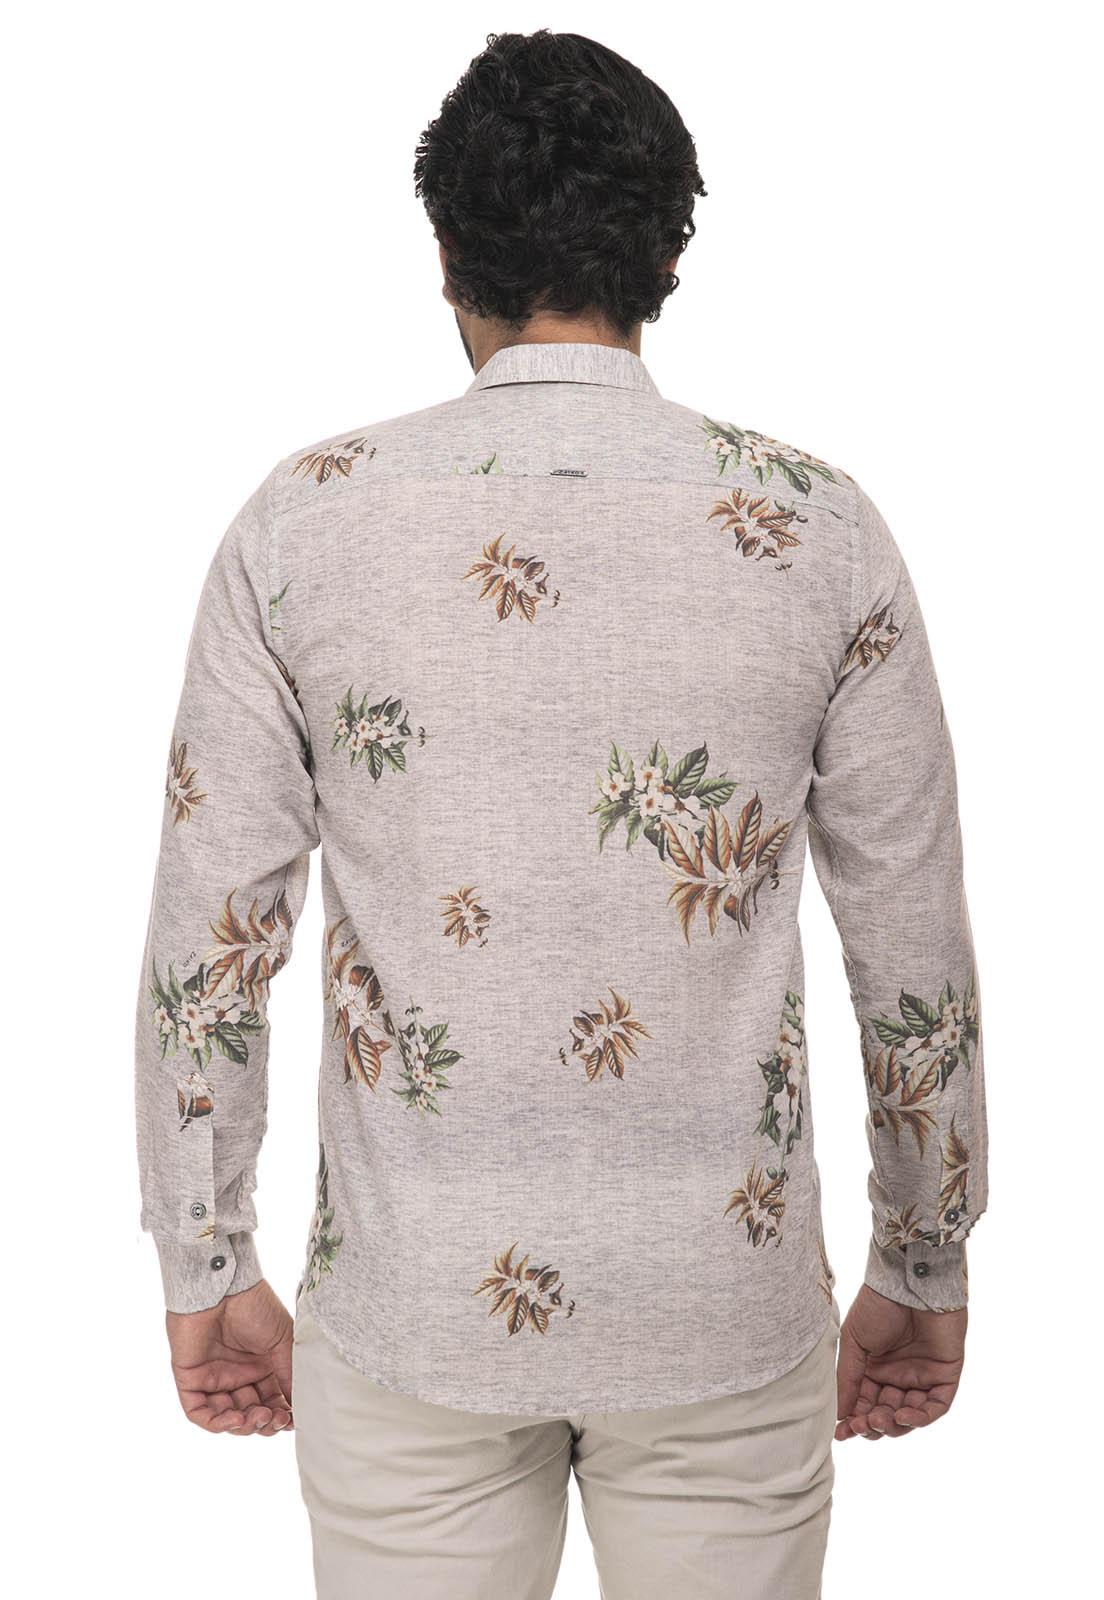 Camisa Slim Zaiko Estampada Floral Manga Longa 2258